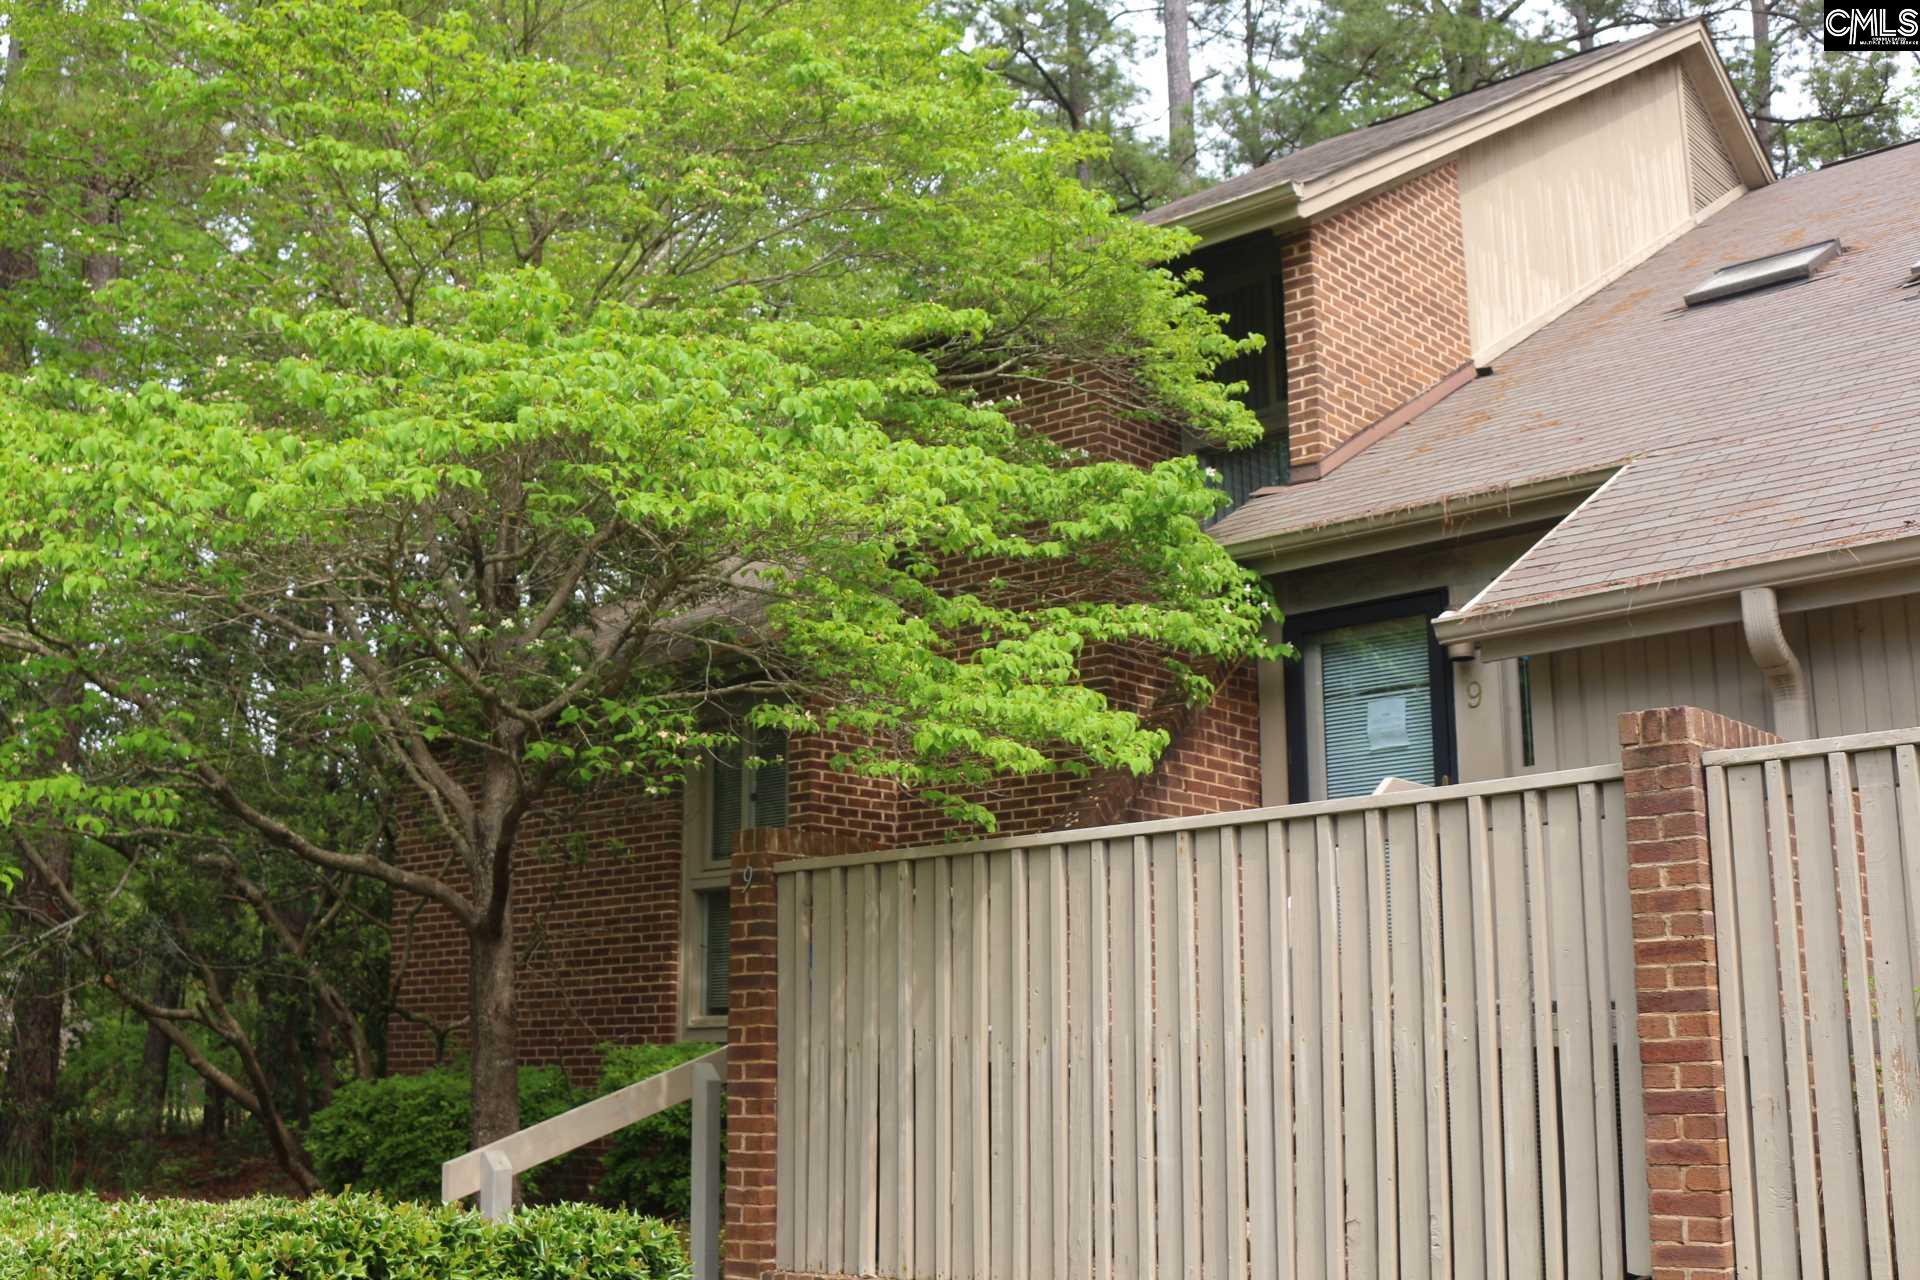 9 Gardenwood Columbia, SC 29209